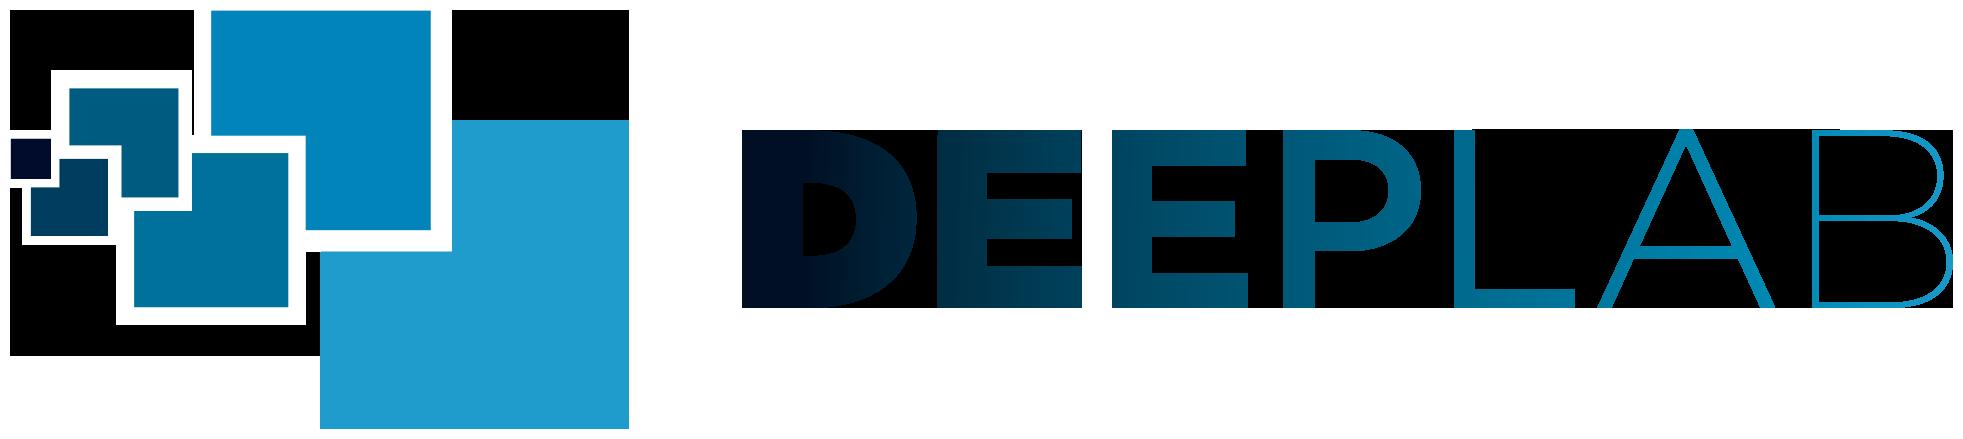 DeepLab